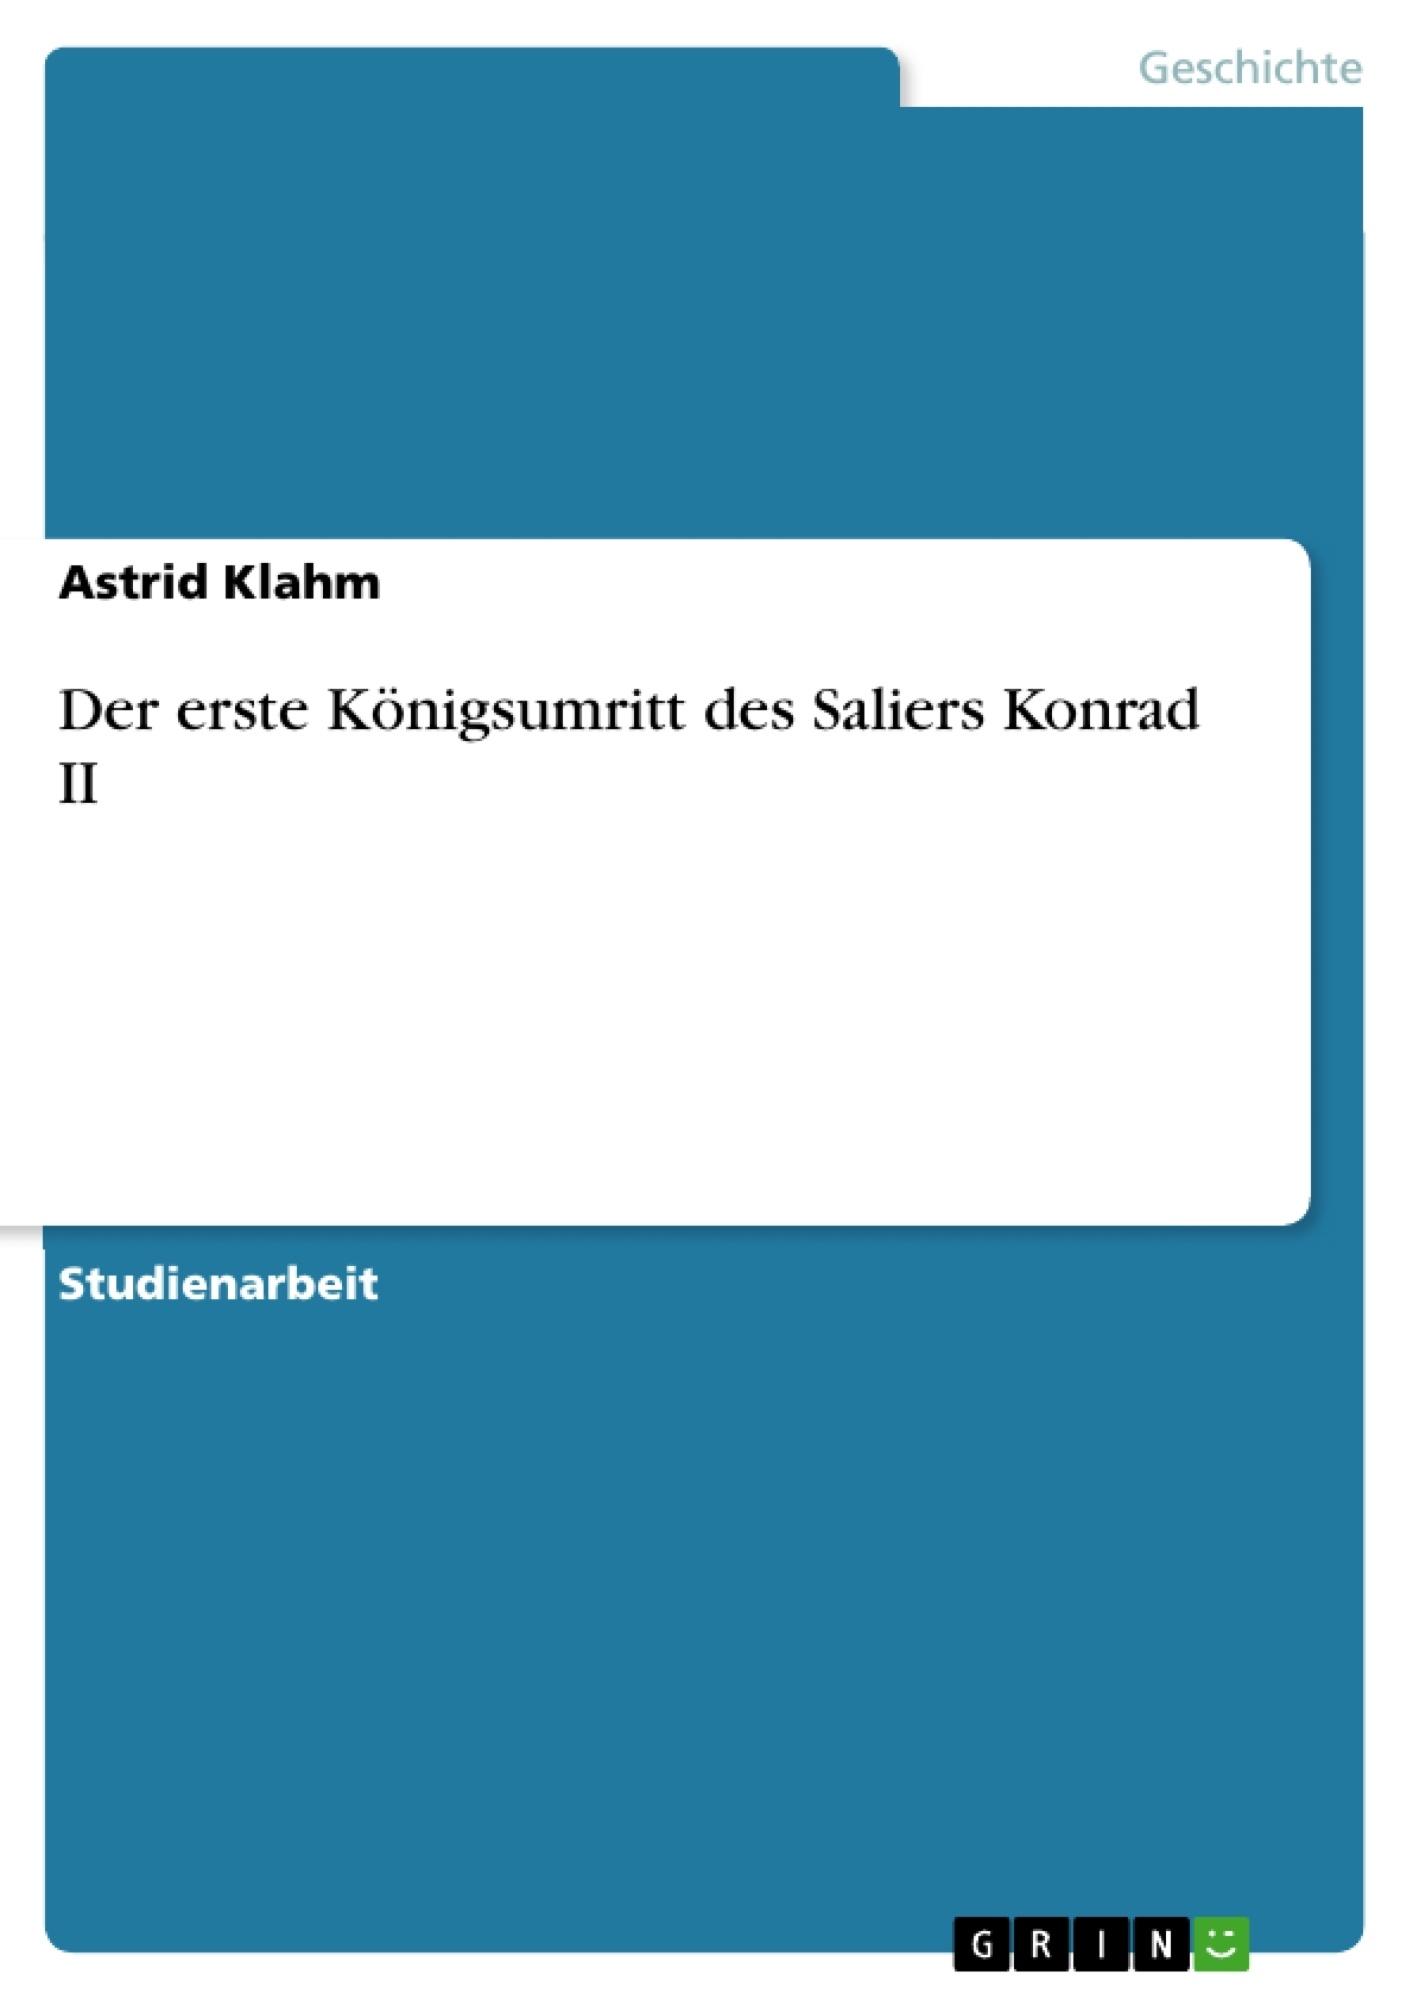 Titel: Der erste Königsumritt des Saliers Konrad II